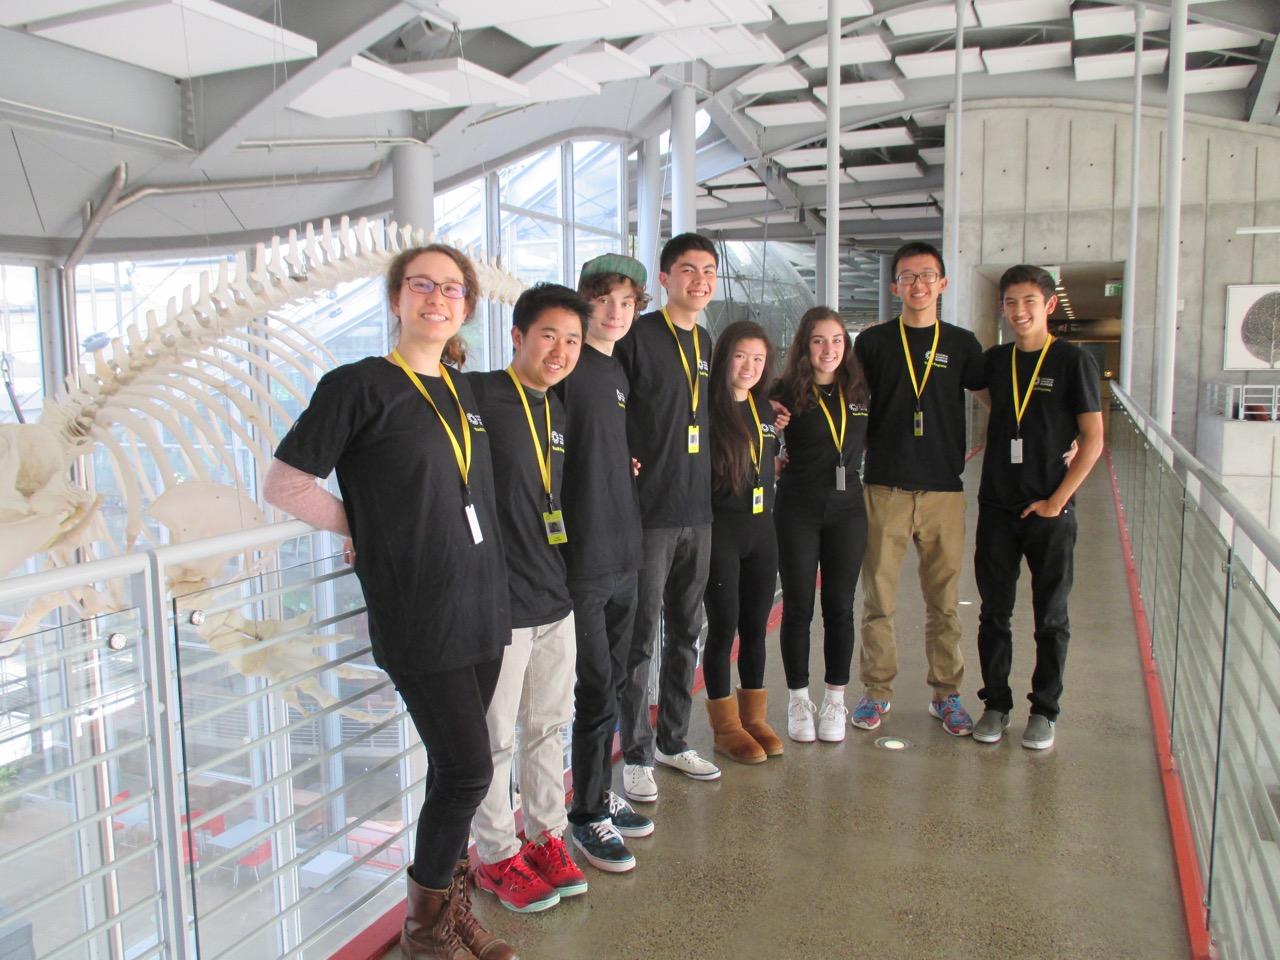 News team on the catwalk